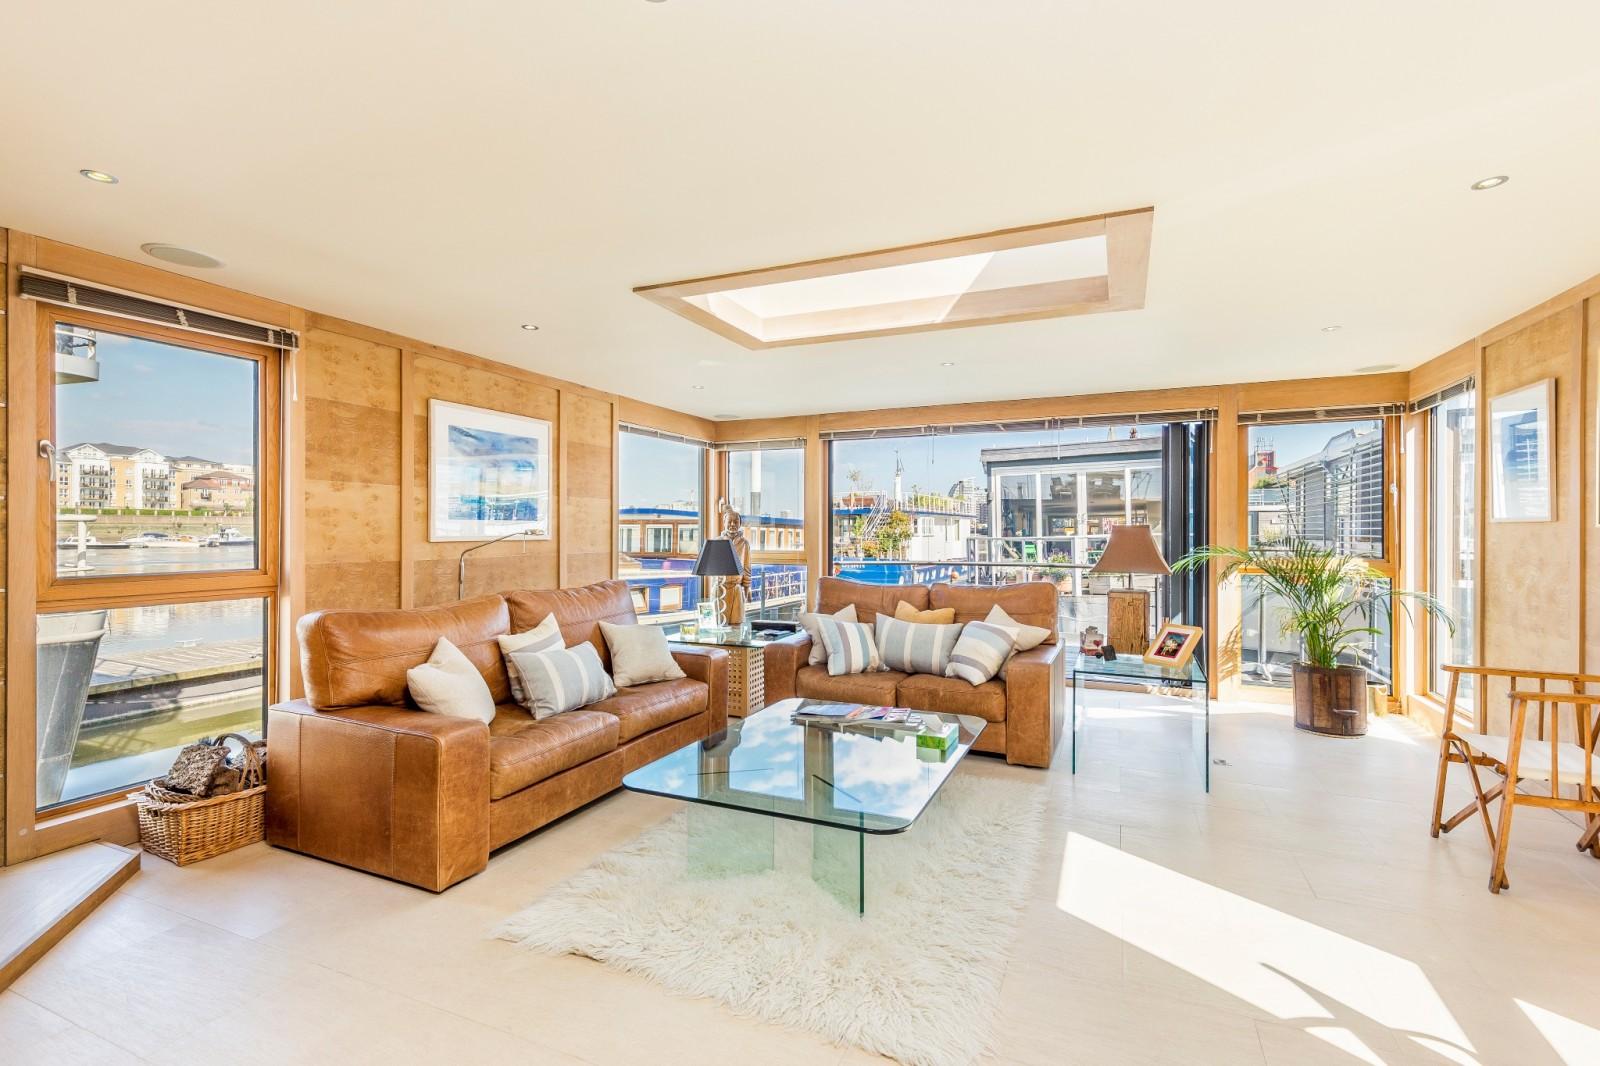 Mr Price Home Design Quarter 3 Bedroom Property For Sale In Riverside Quarter Moorings